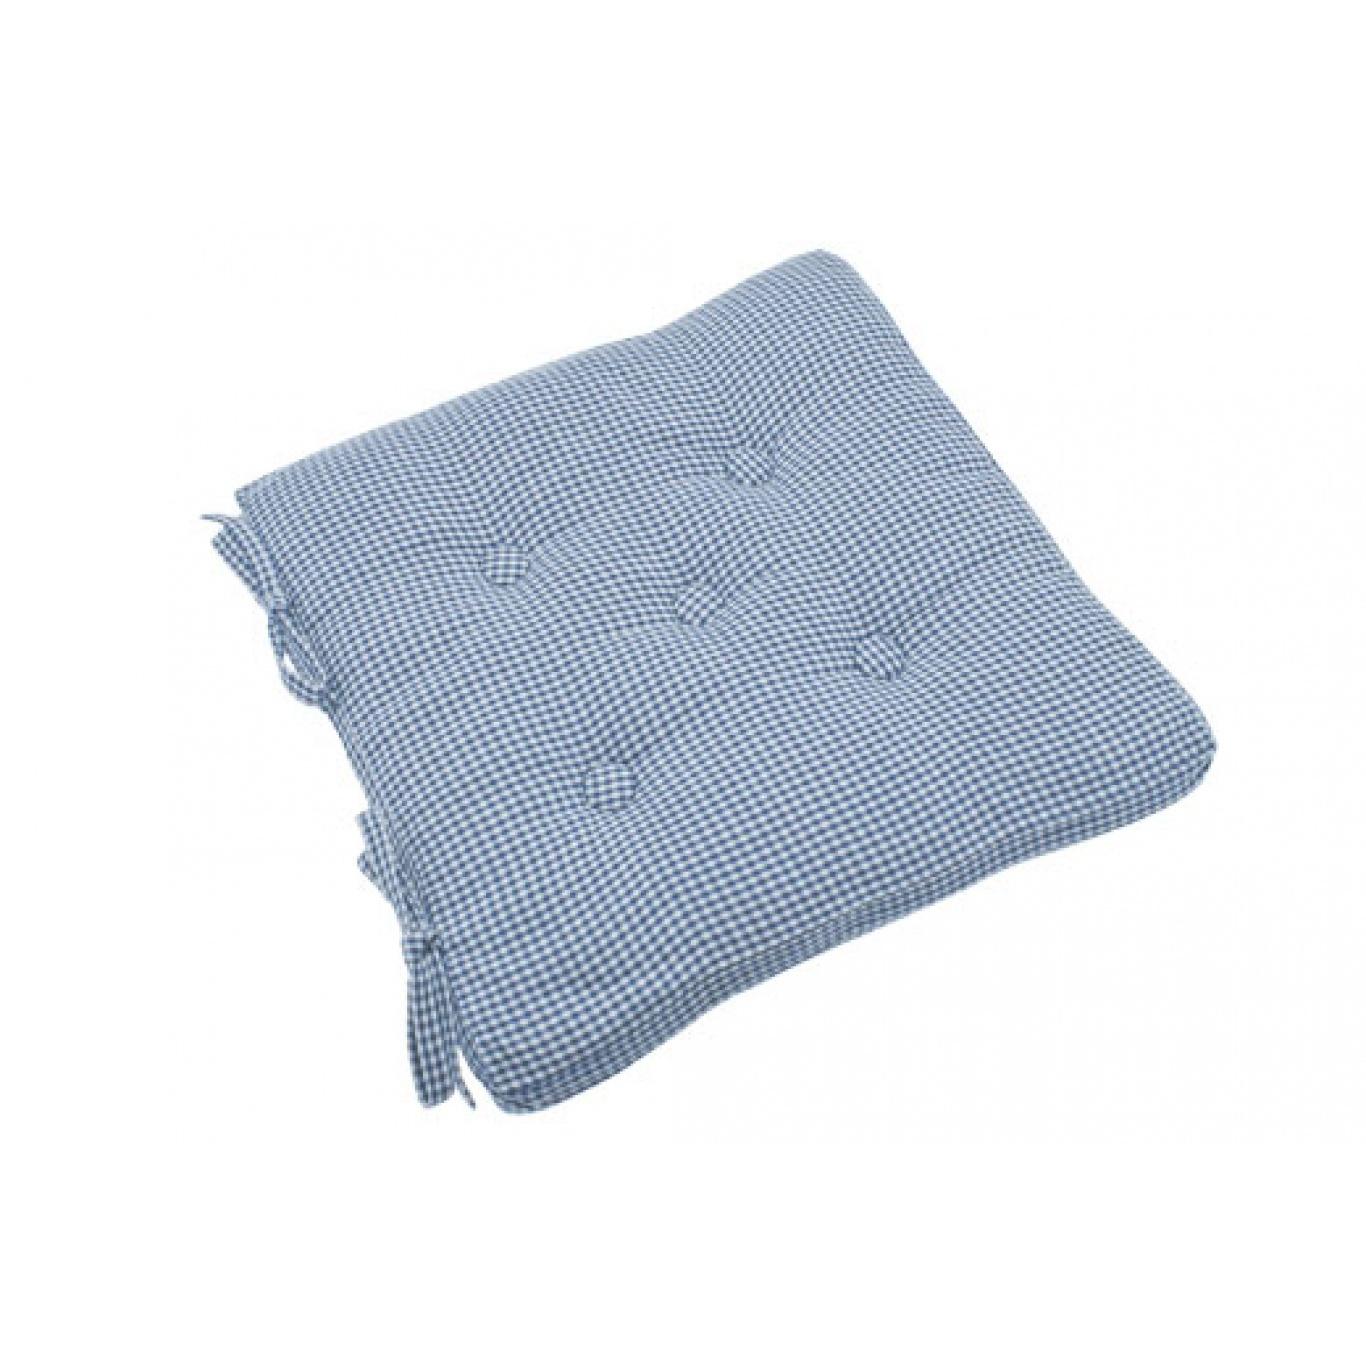 Image of Auberge Nordic Blue Seat Pad